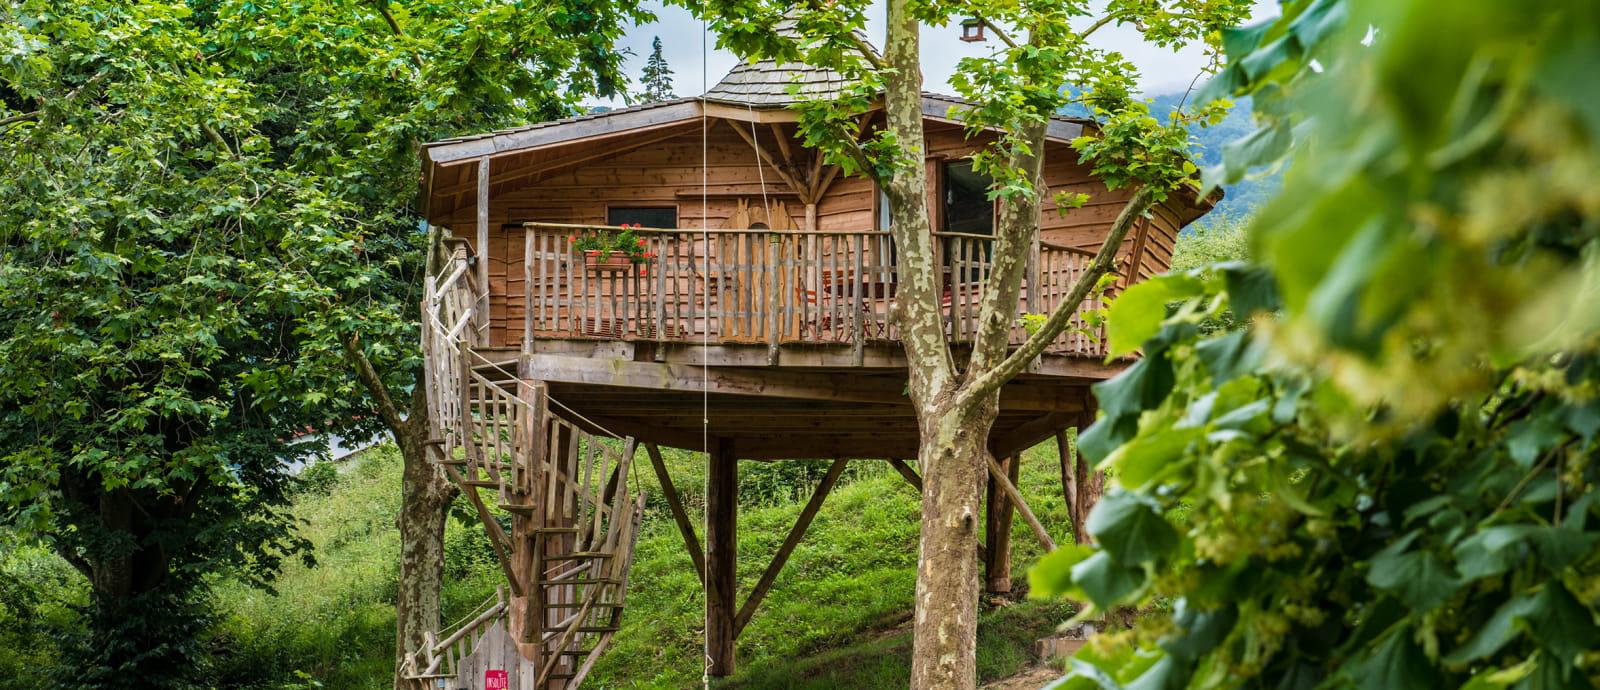 cabane en bois dans les arbres - hotel andreinia - esterencuby